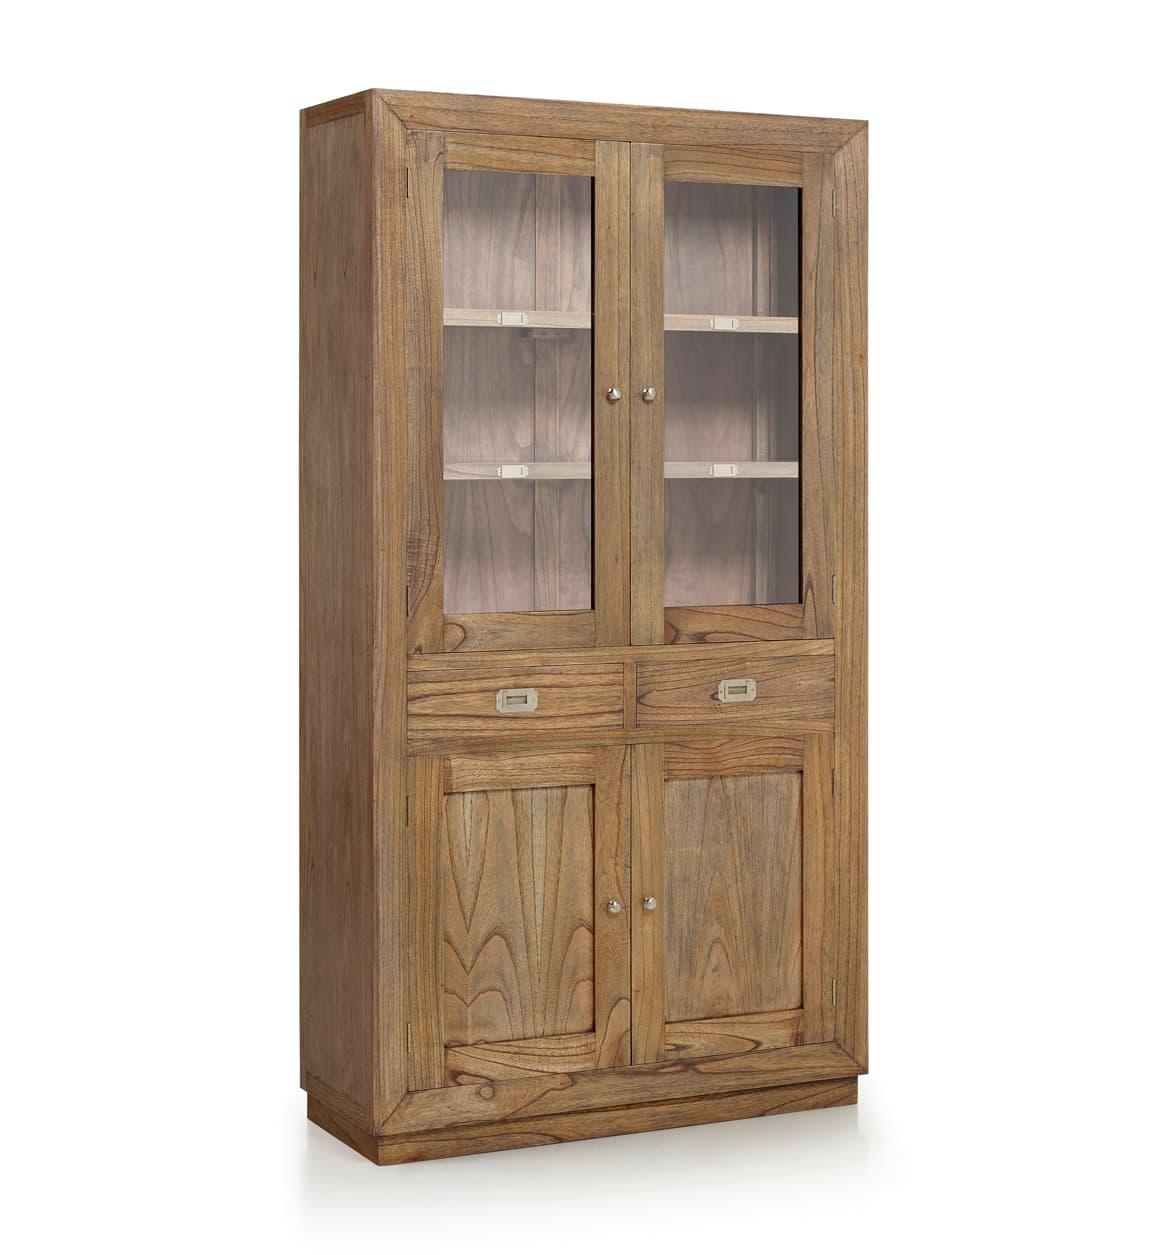 Vitrina din lemn cu 2 sertare si 4 usi, Merapi Natural, l100xA40xH190 cm somproduct.ro